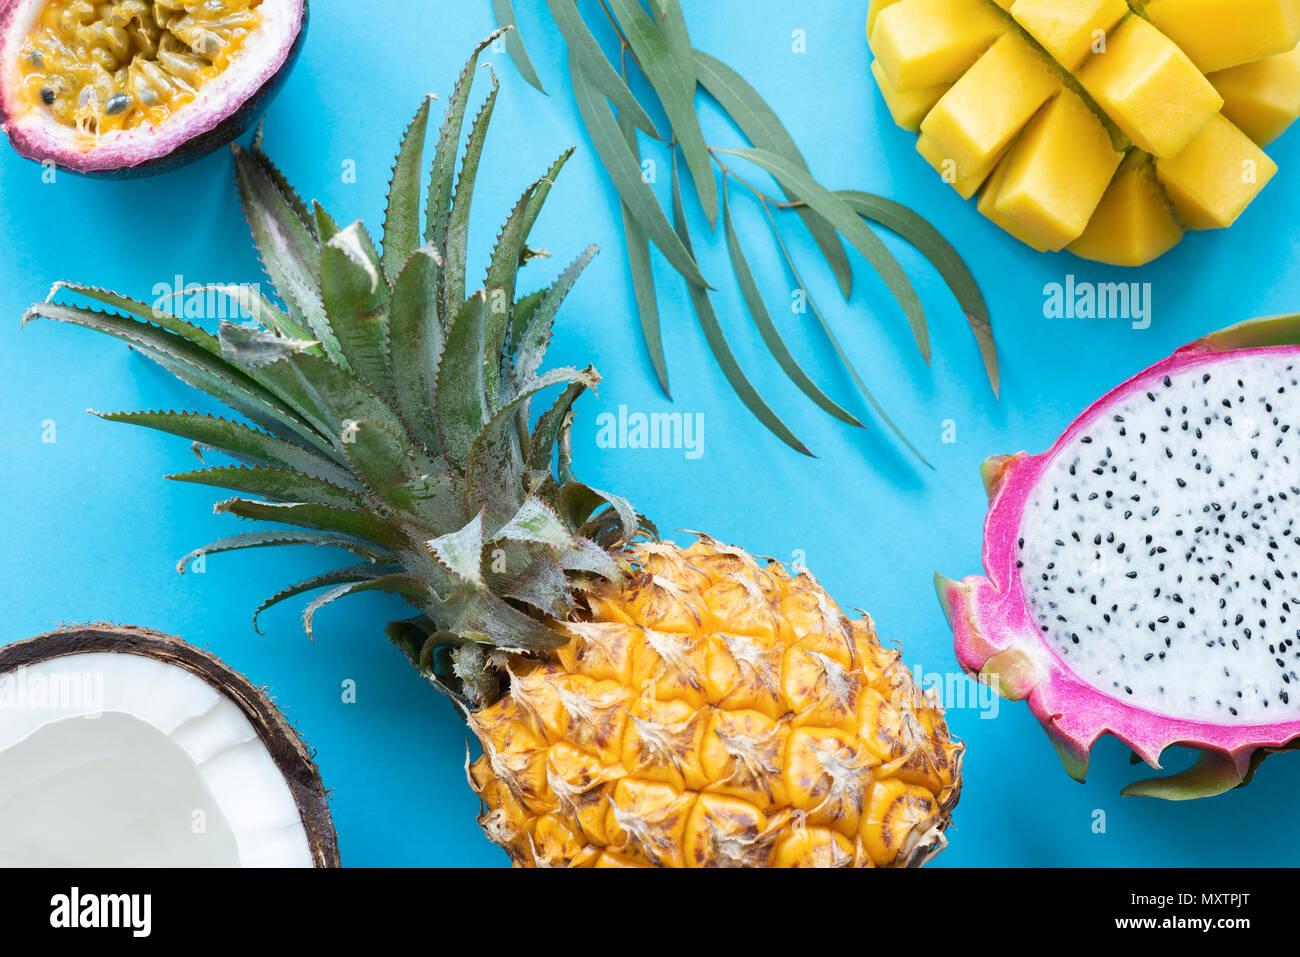 Thai tropical fruits on blue background. Pineapple, mango, pitaya, coconut and passion fruit flat lay - Stock Image